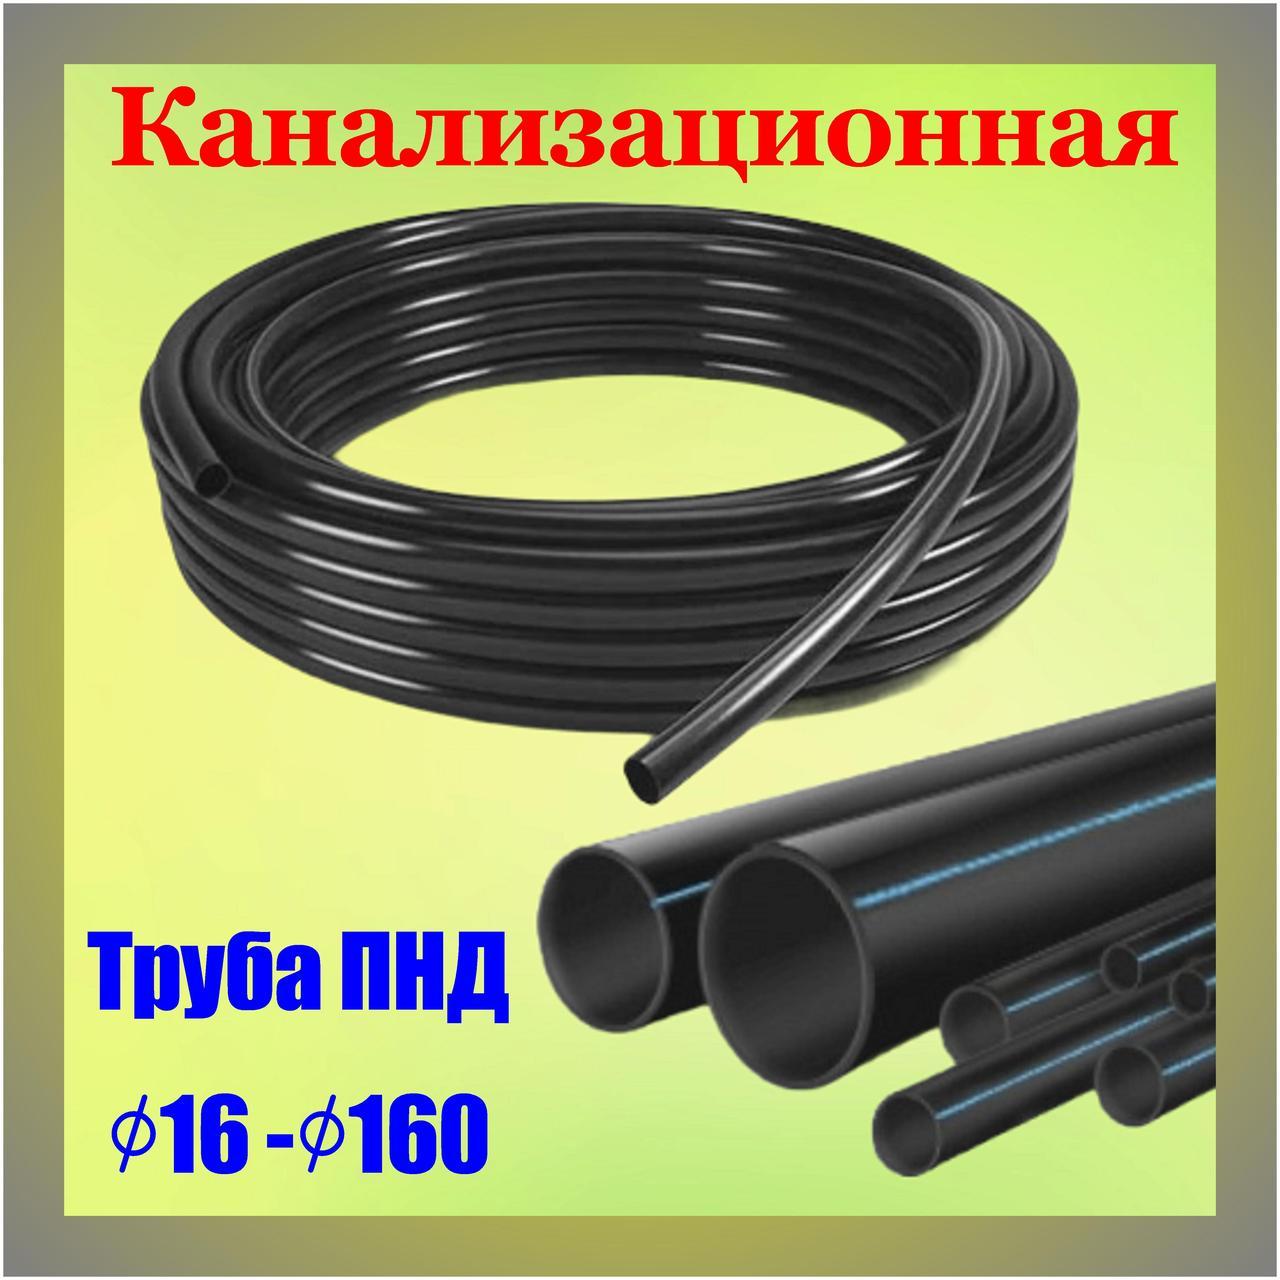 Труба ПНД 63 мм канализационная